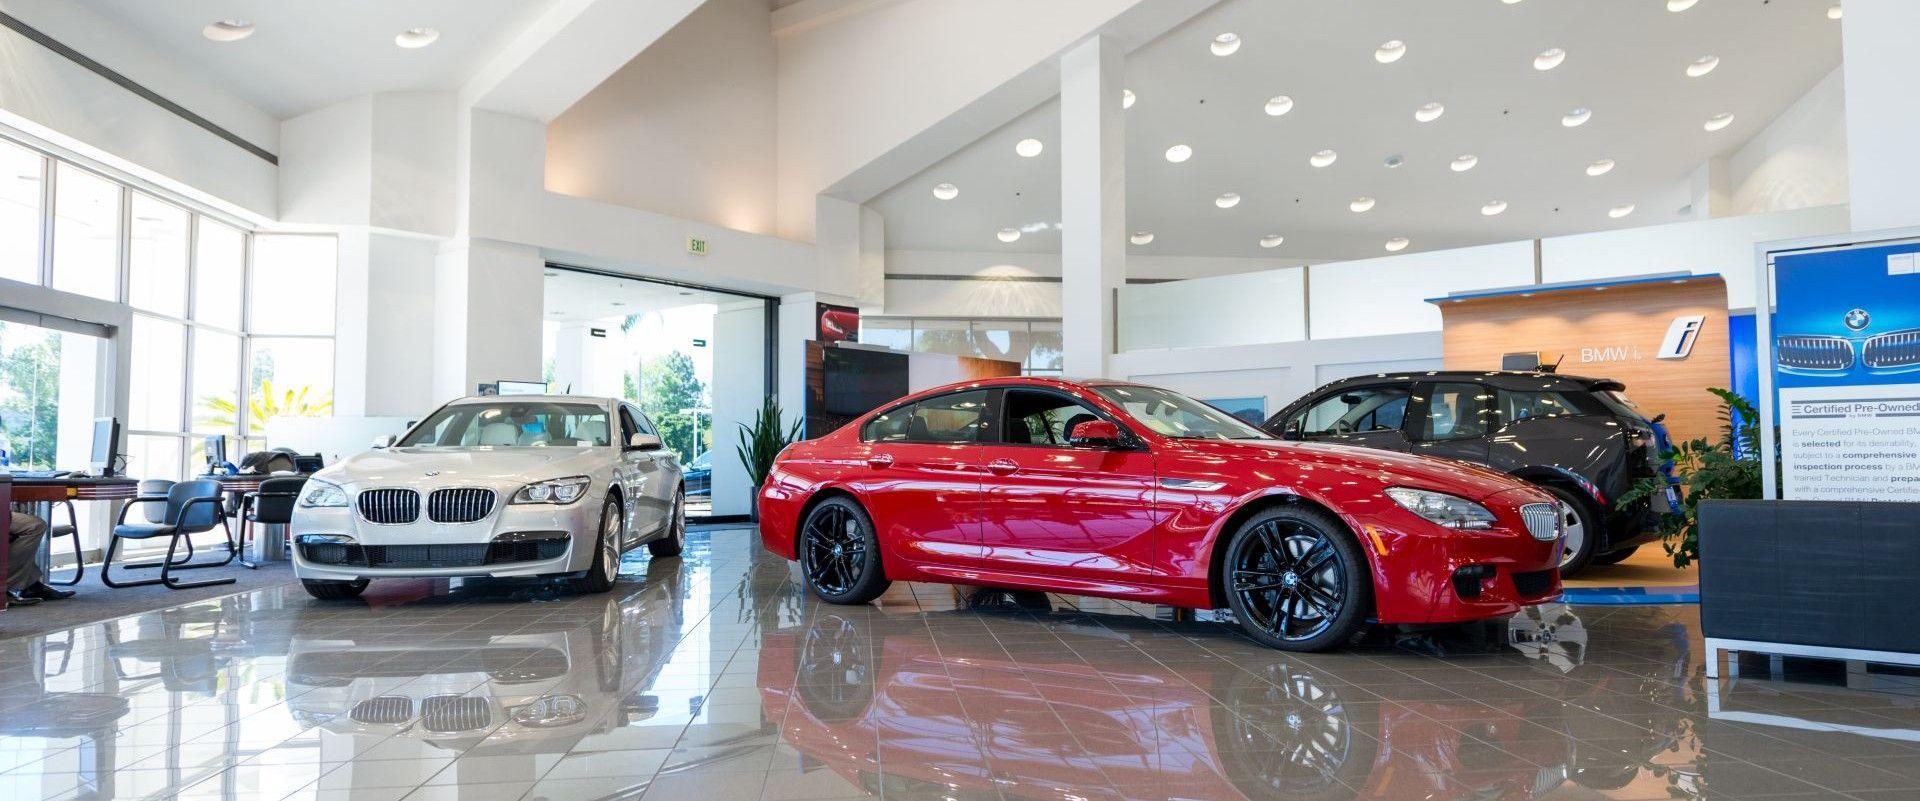 BMW Santa Barbara Drivers Can Save on Winter Wheel and